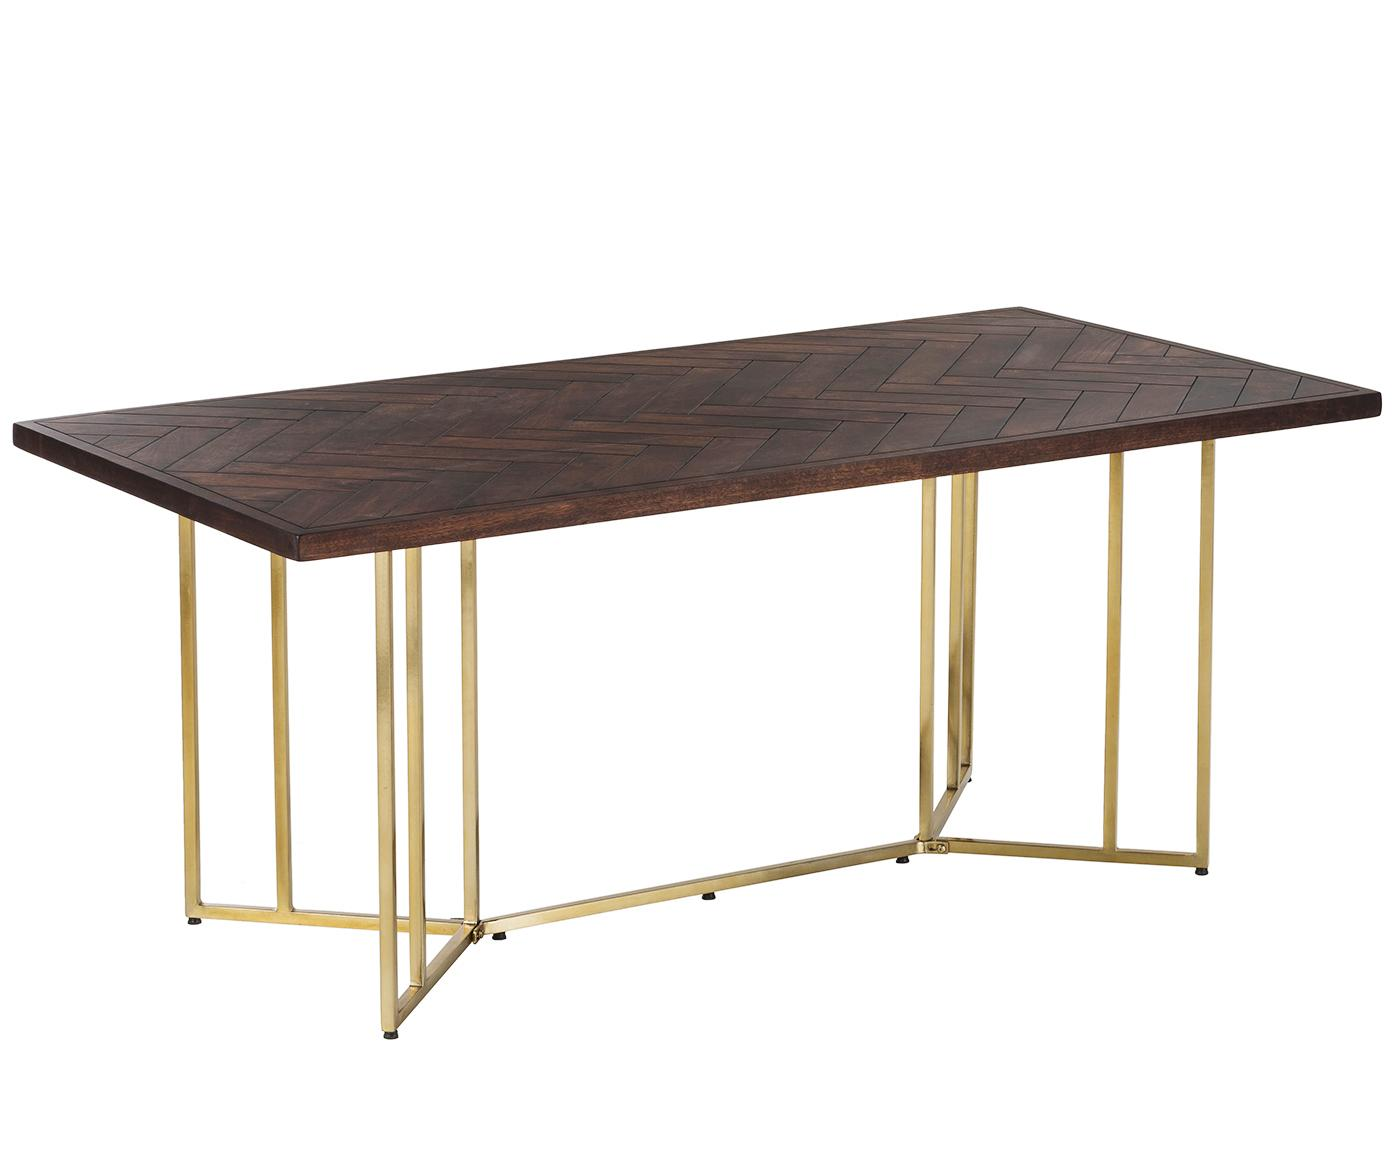 Mesa de comedor Luca, tablero de madera maciza, Tablero: madera de mango, Estructura: metal, recubierto, Madera oscura, dorado, An 180 x F 90 cm